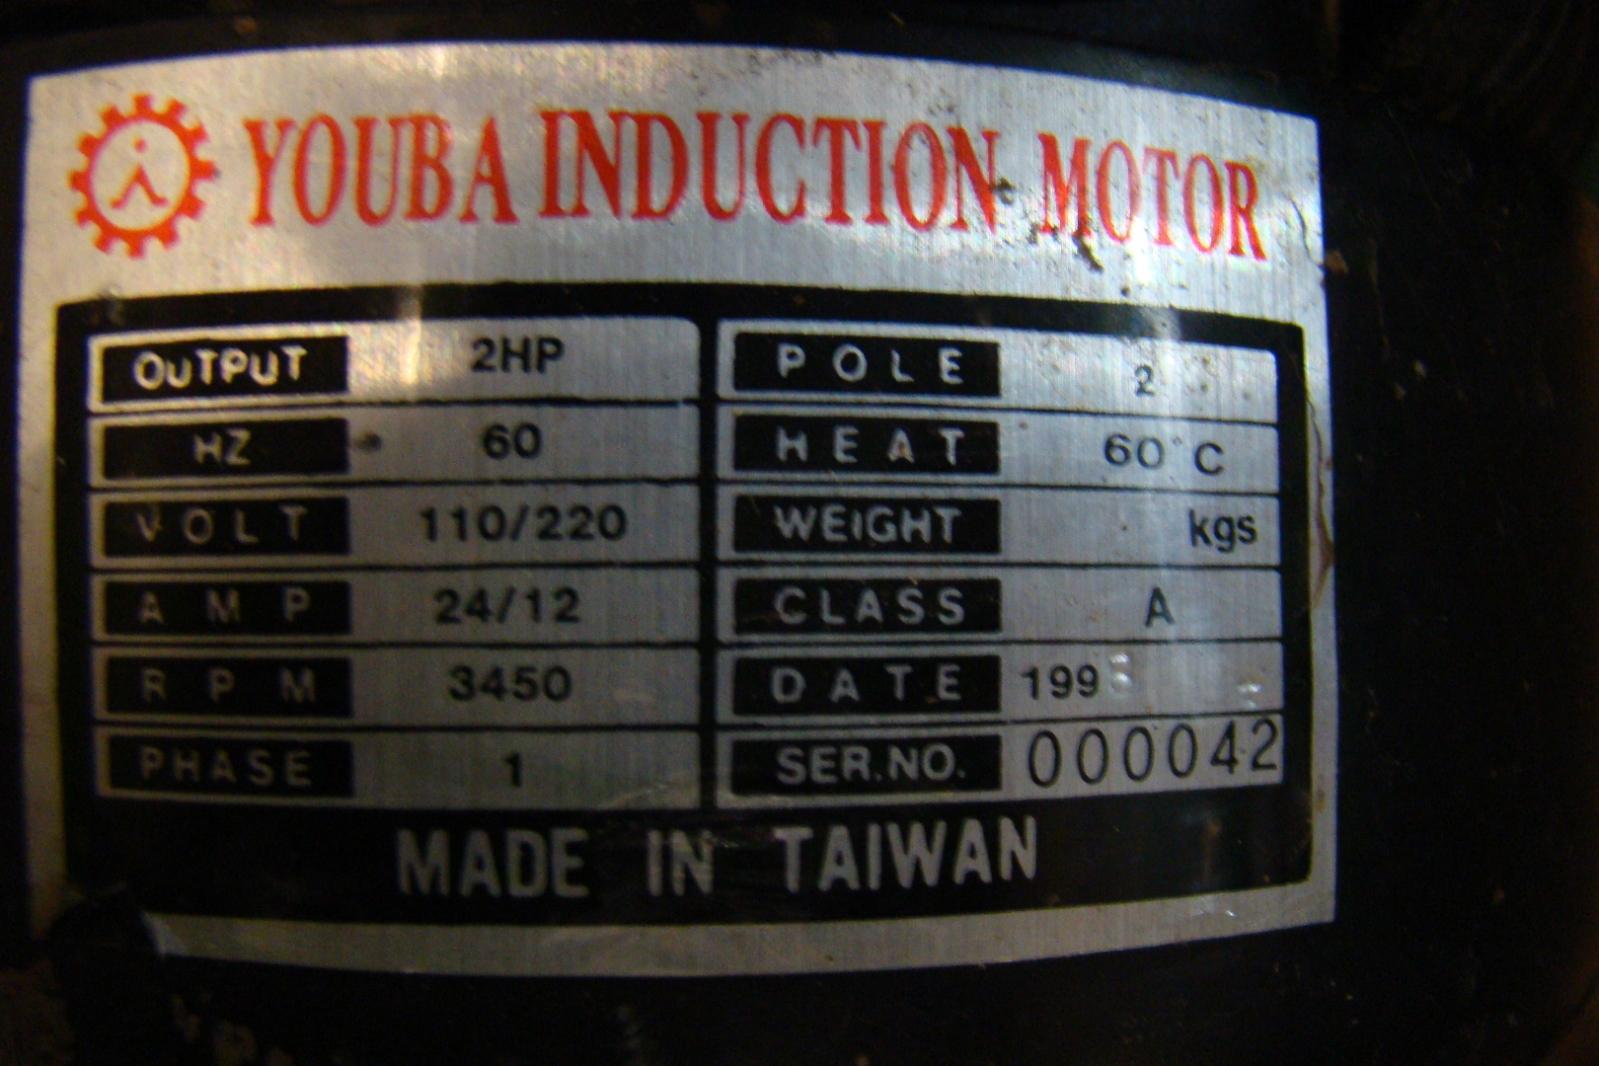 Kufo Blower 1224 Cfm Youba 2hp Motor 110v 220v Uf0 101 Ebay 2 Hp Wiring